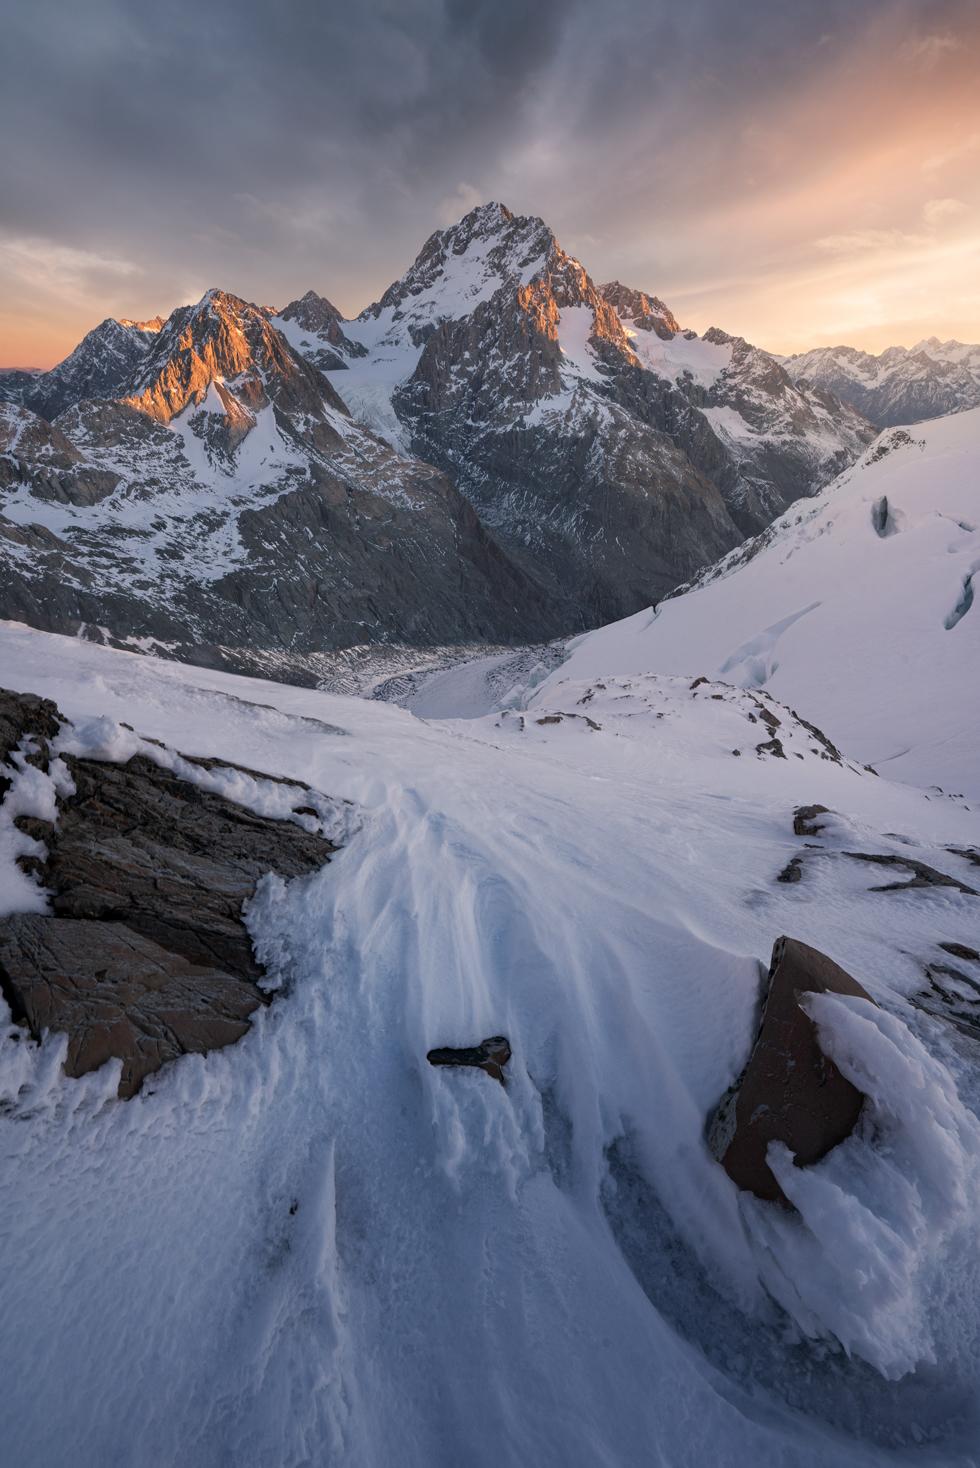 Southern Alps, D'Archiac Copyright William Patino, New Zealand Landscape Photographer